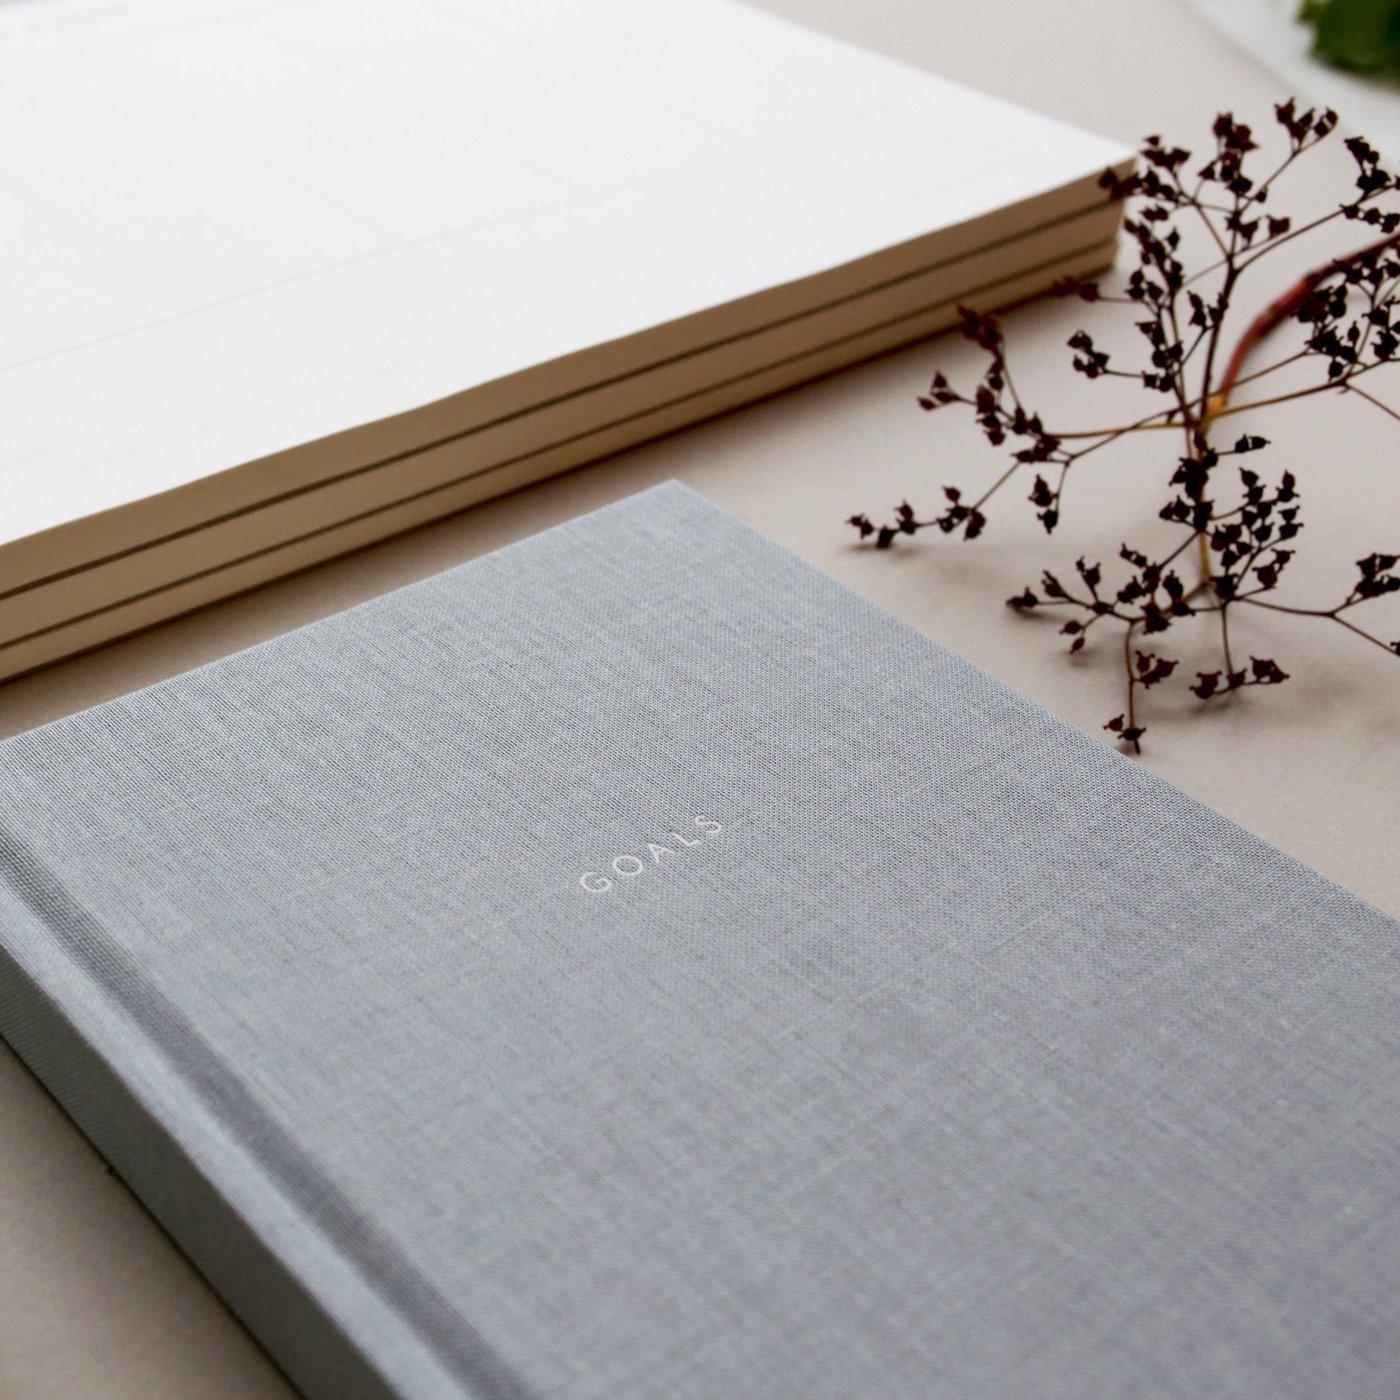 KARTOTEK - Goals Journal